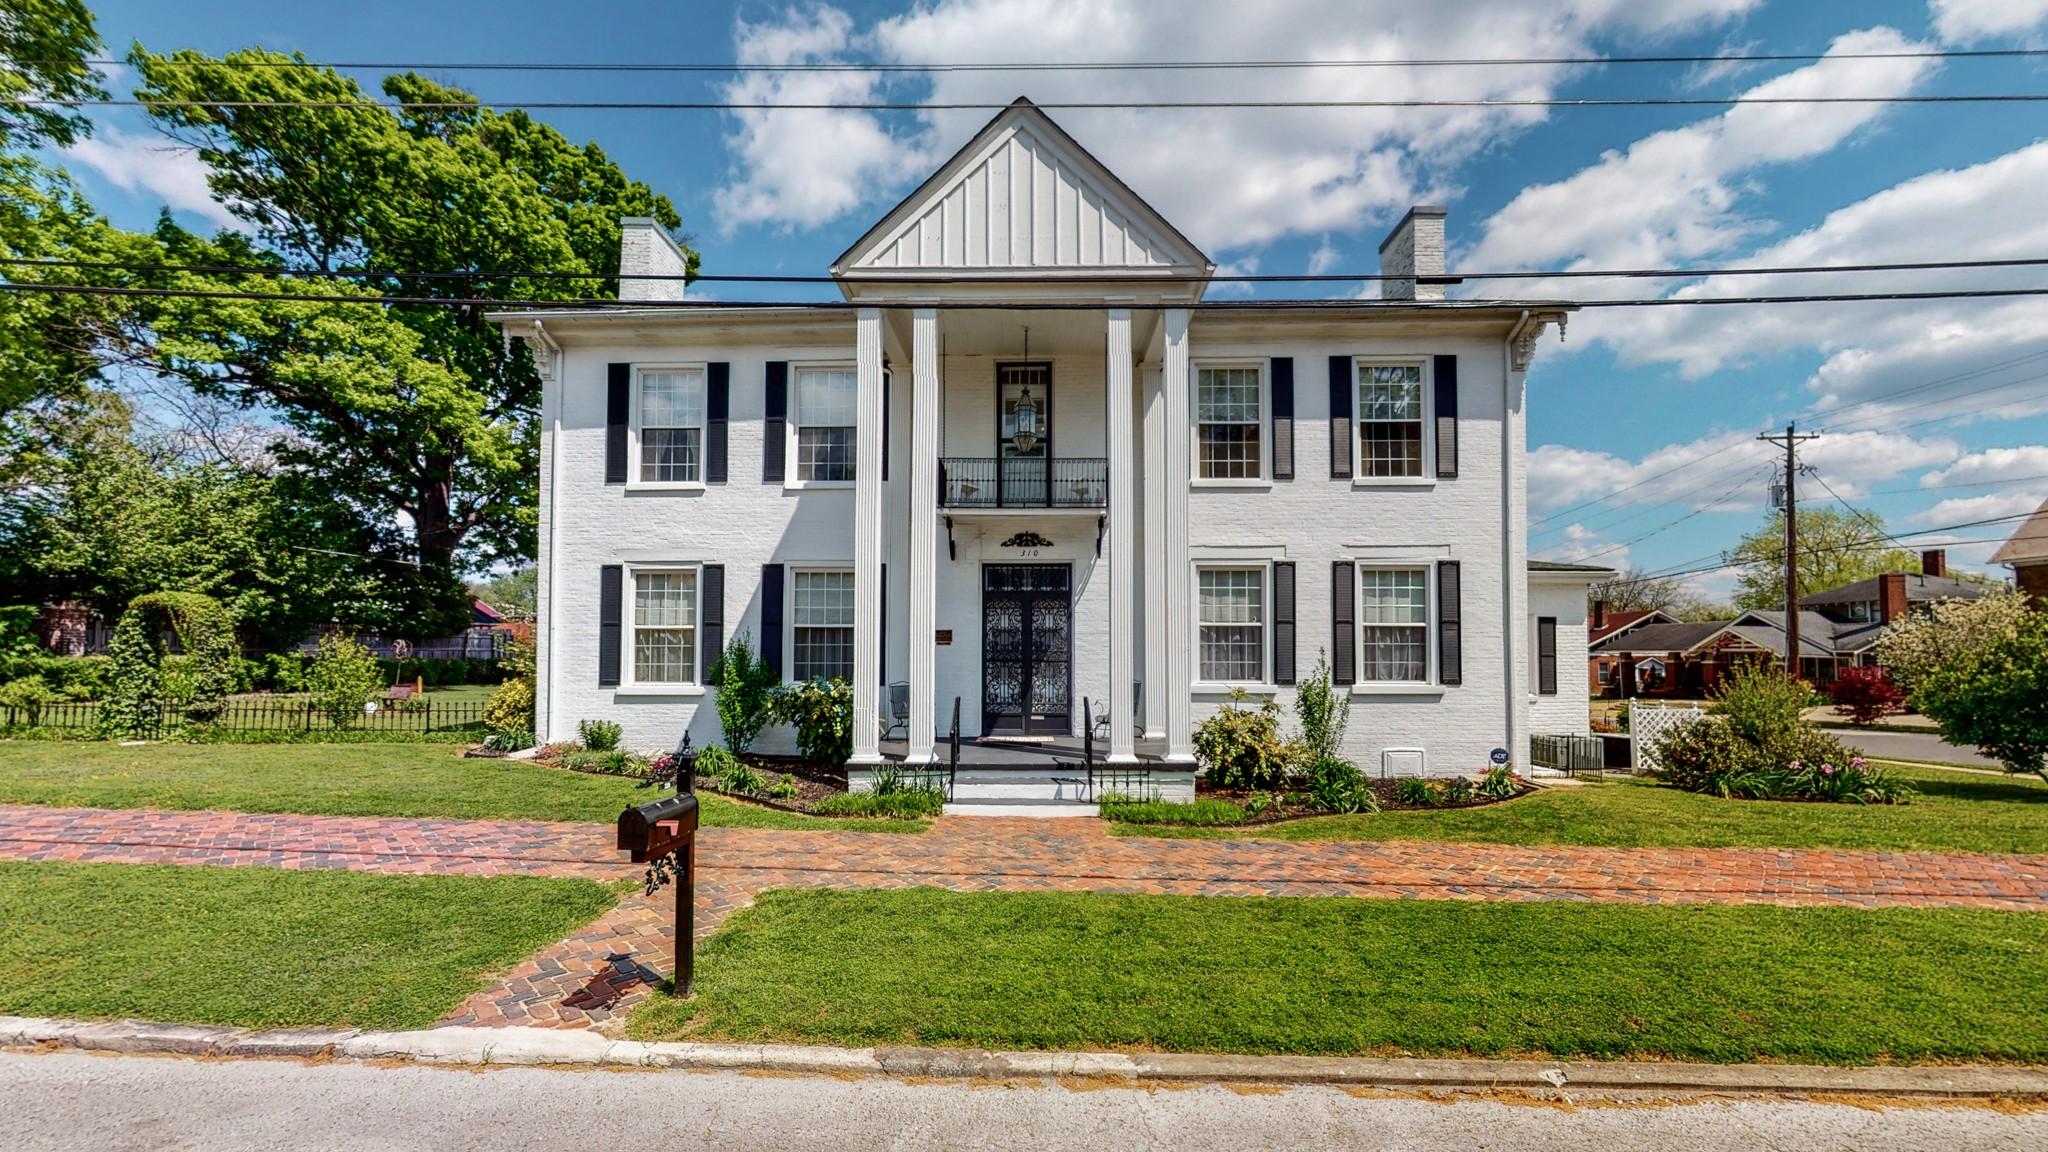 310 Elk Ave S Property Photo - Fayetteville, TN real estate listing